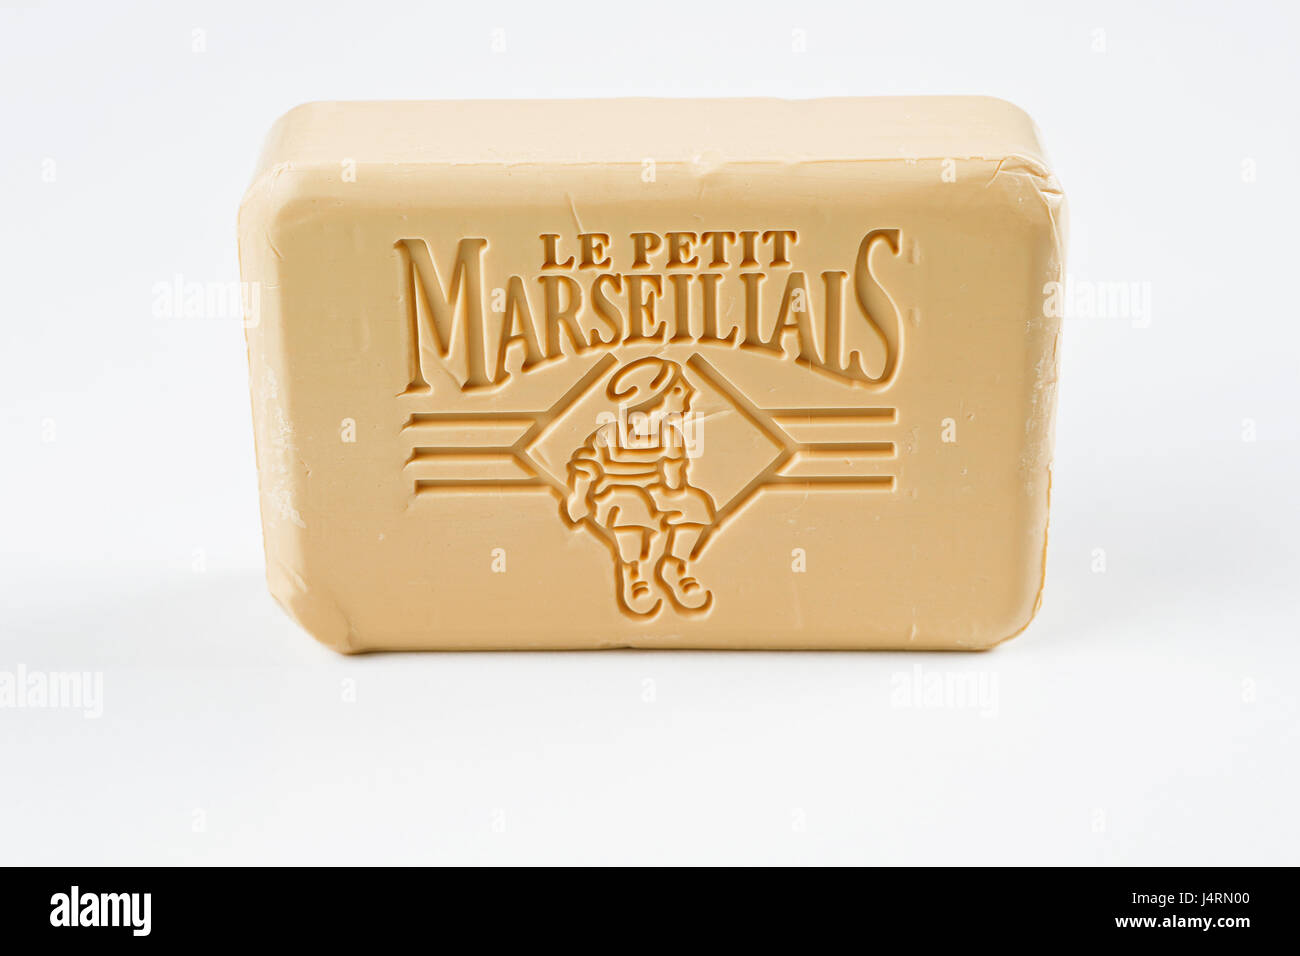 Soap, le petit marseillais cut out on white background - Stock Image